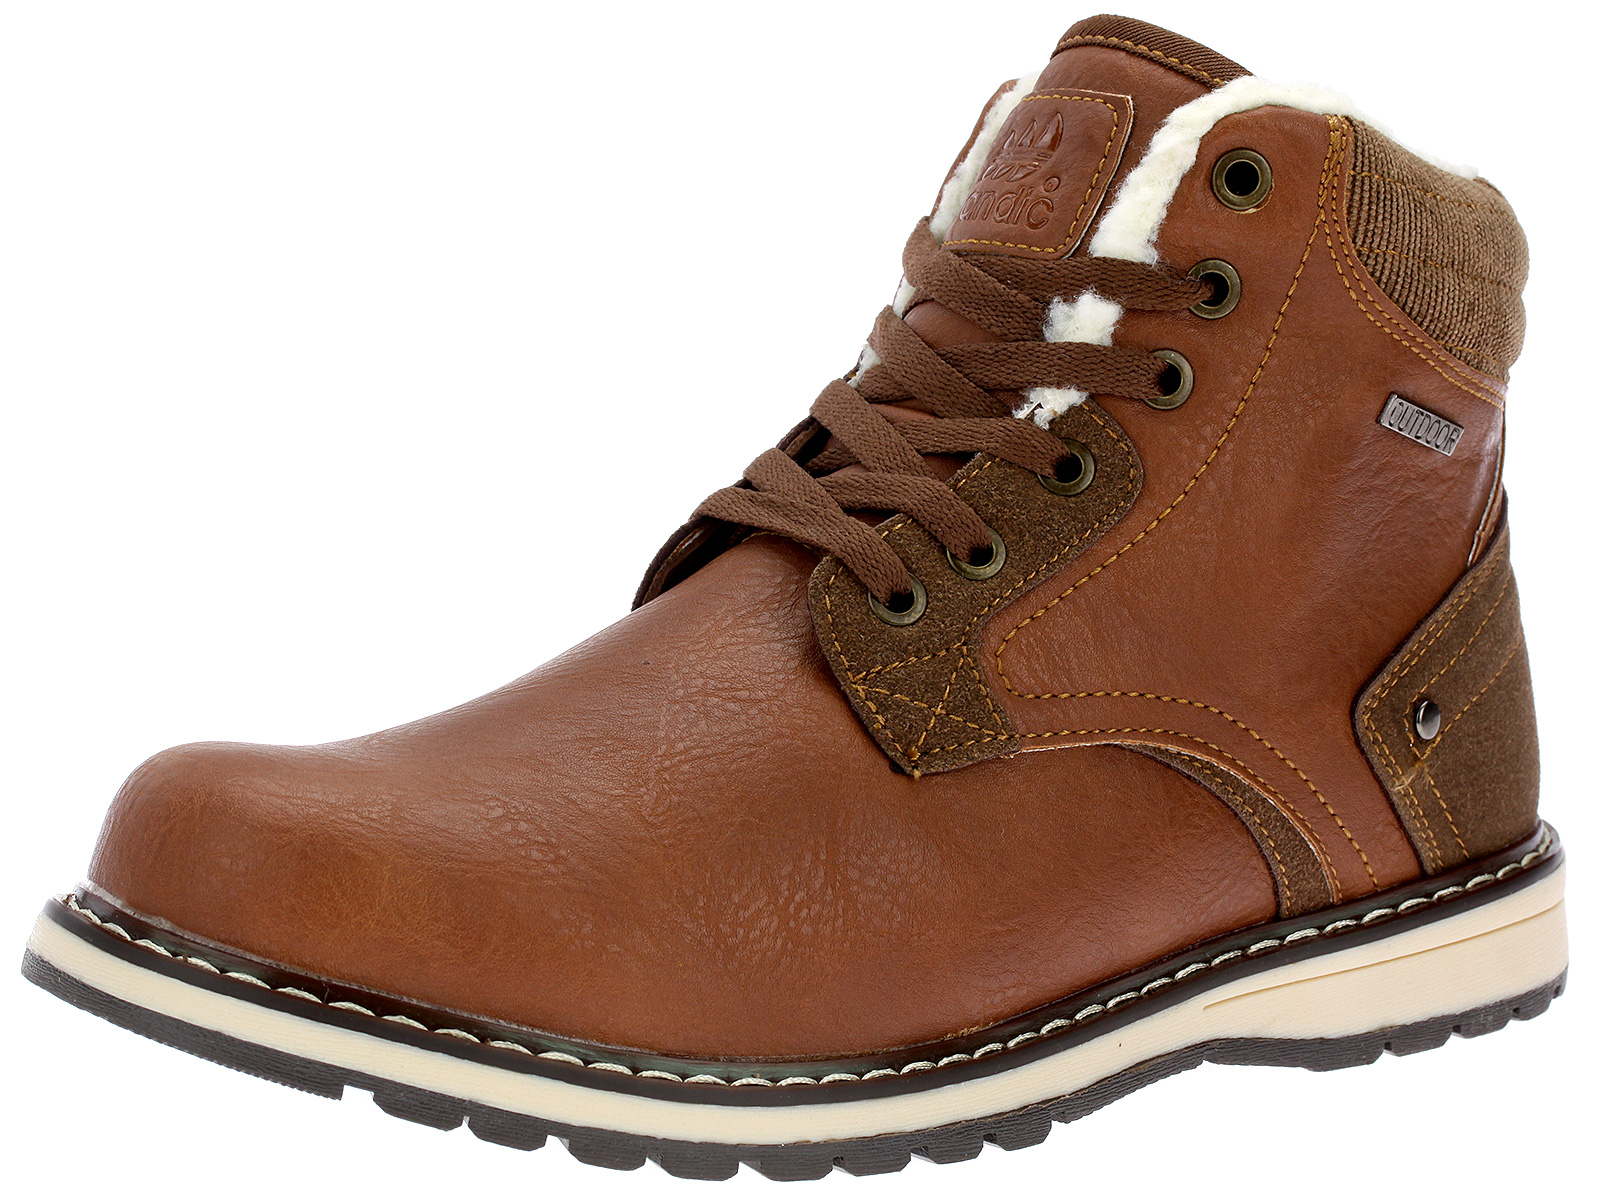 Herren Stiefel Boots Stiefeletten Gefüttert Reißverschluss Winterschuhe SD216